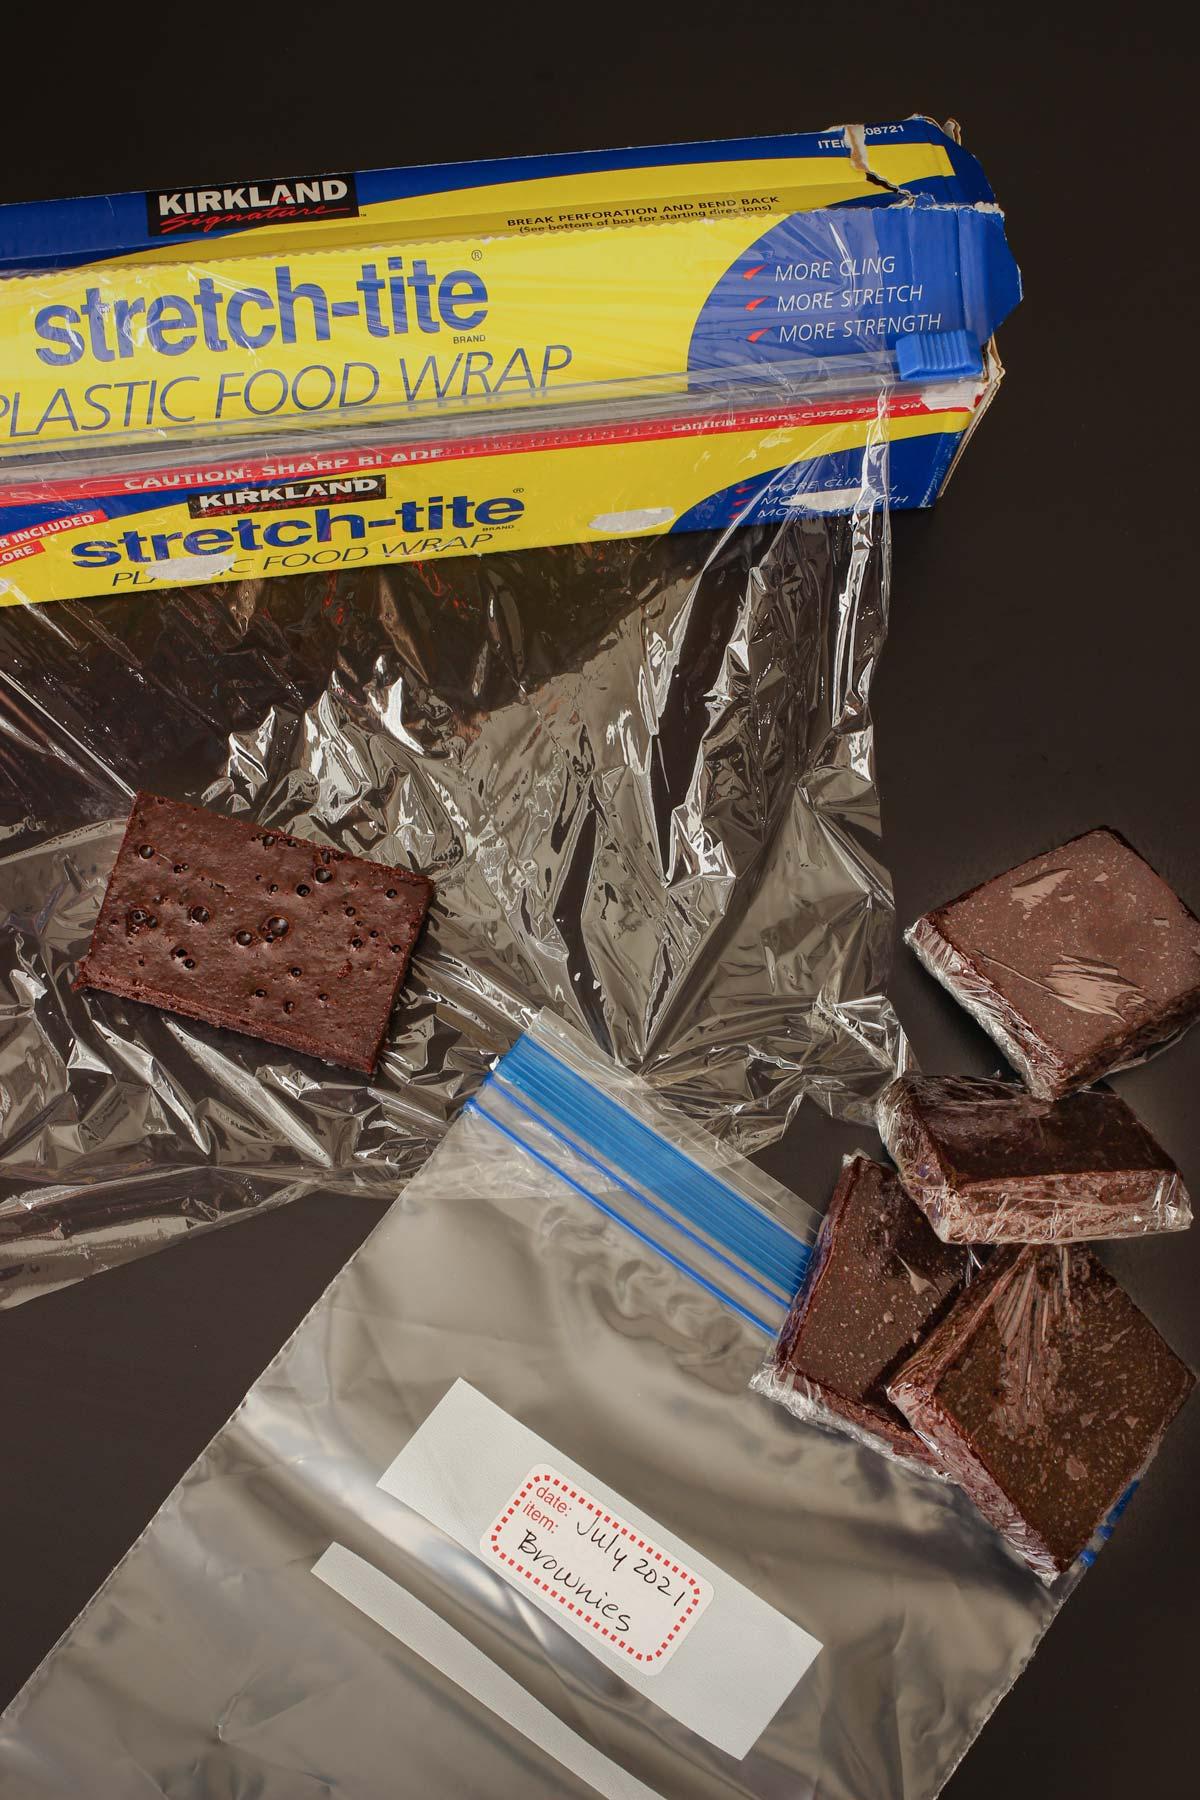 individually wrapped brownies to bag up in ziptop freezer bag.